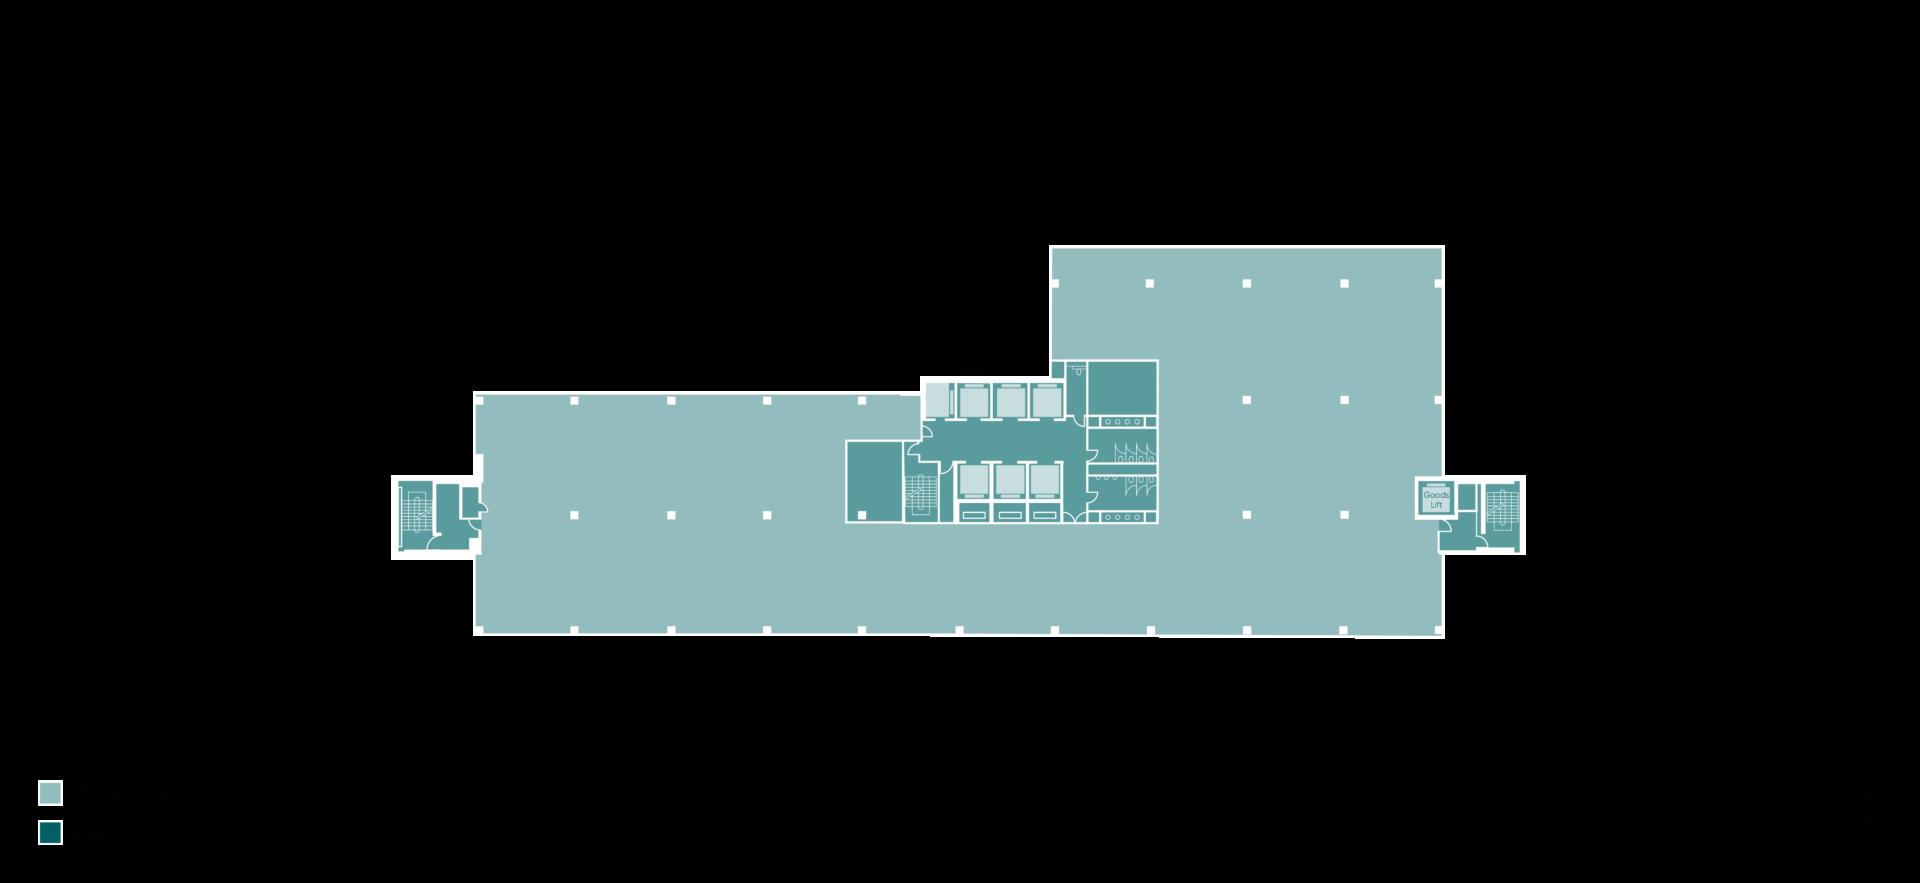 Floorplan of Building HX2 Level 5